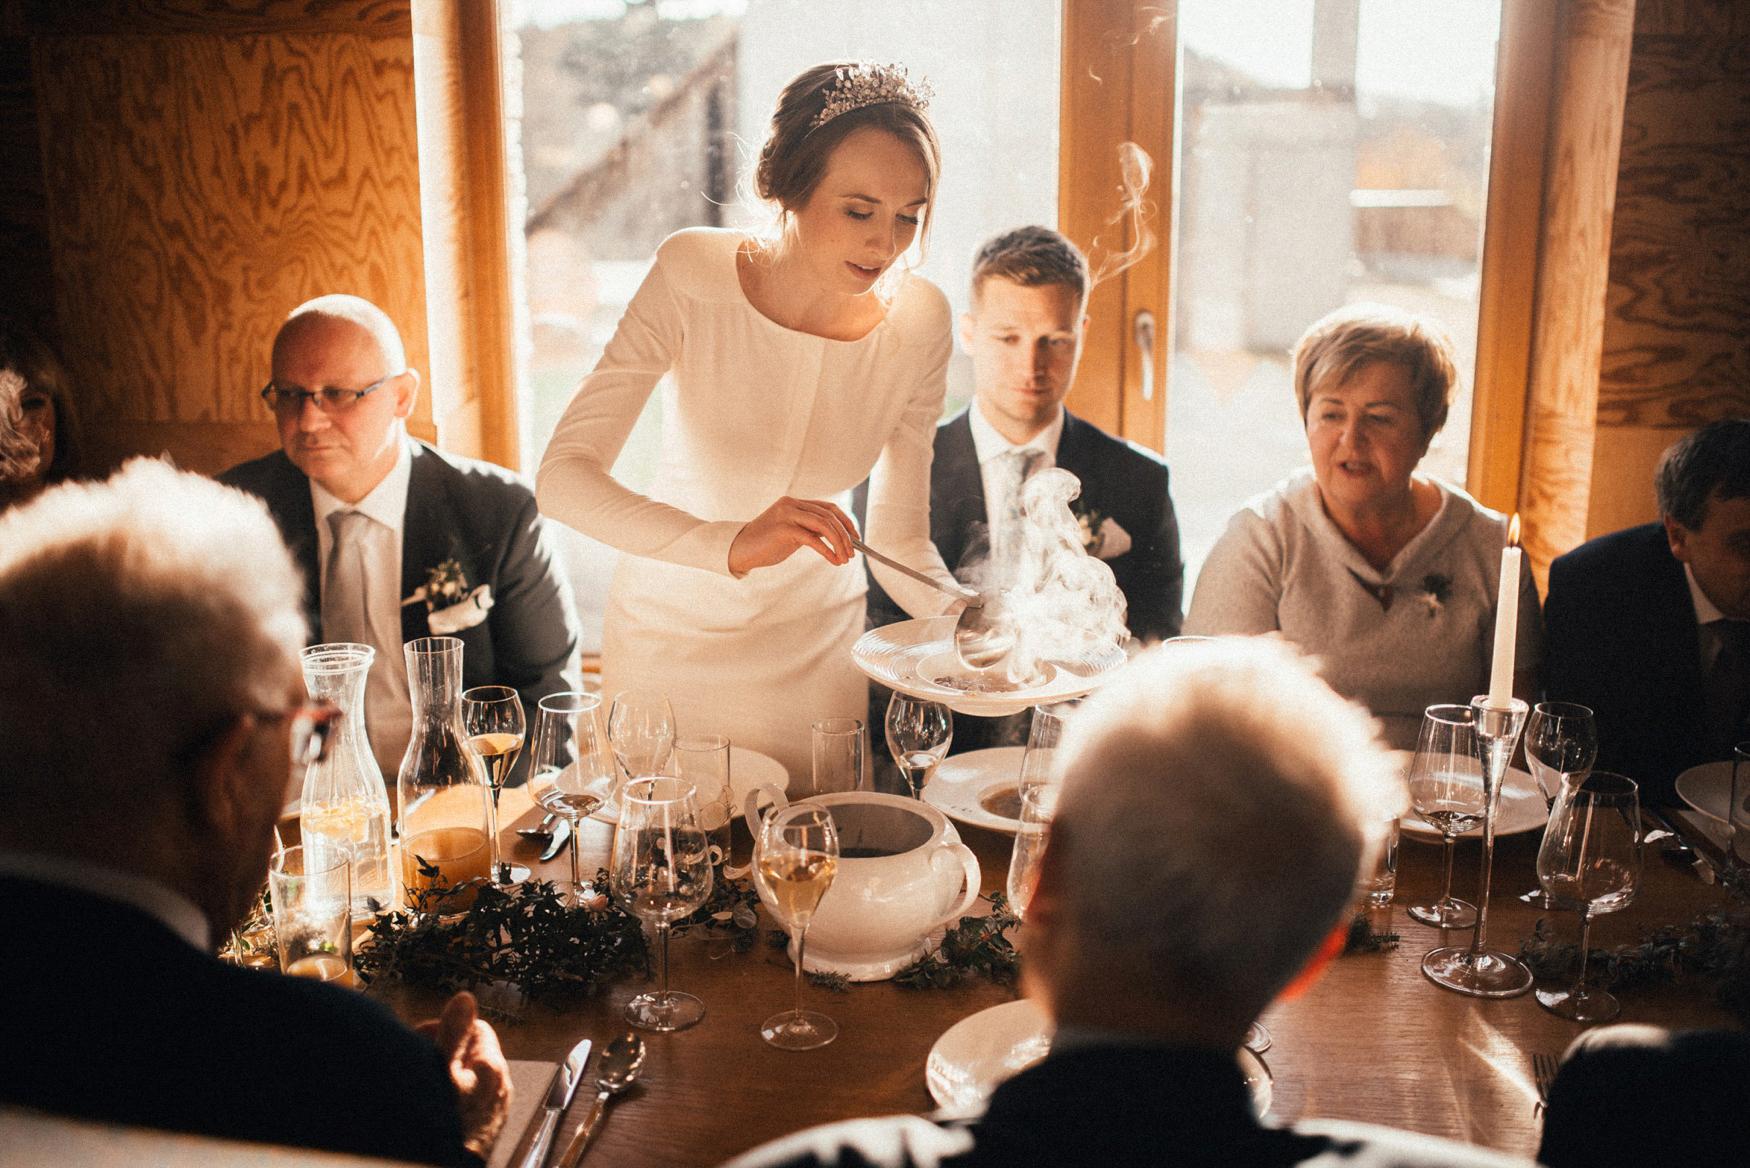 3 czech countryside rustic wedding - svatba zikmundov018.jpg